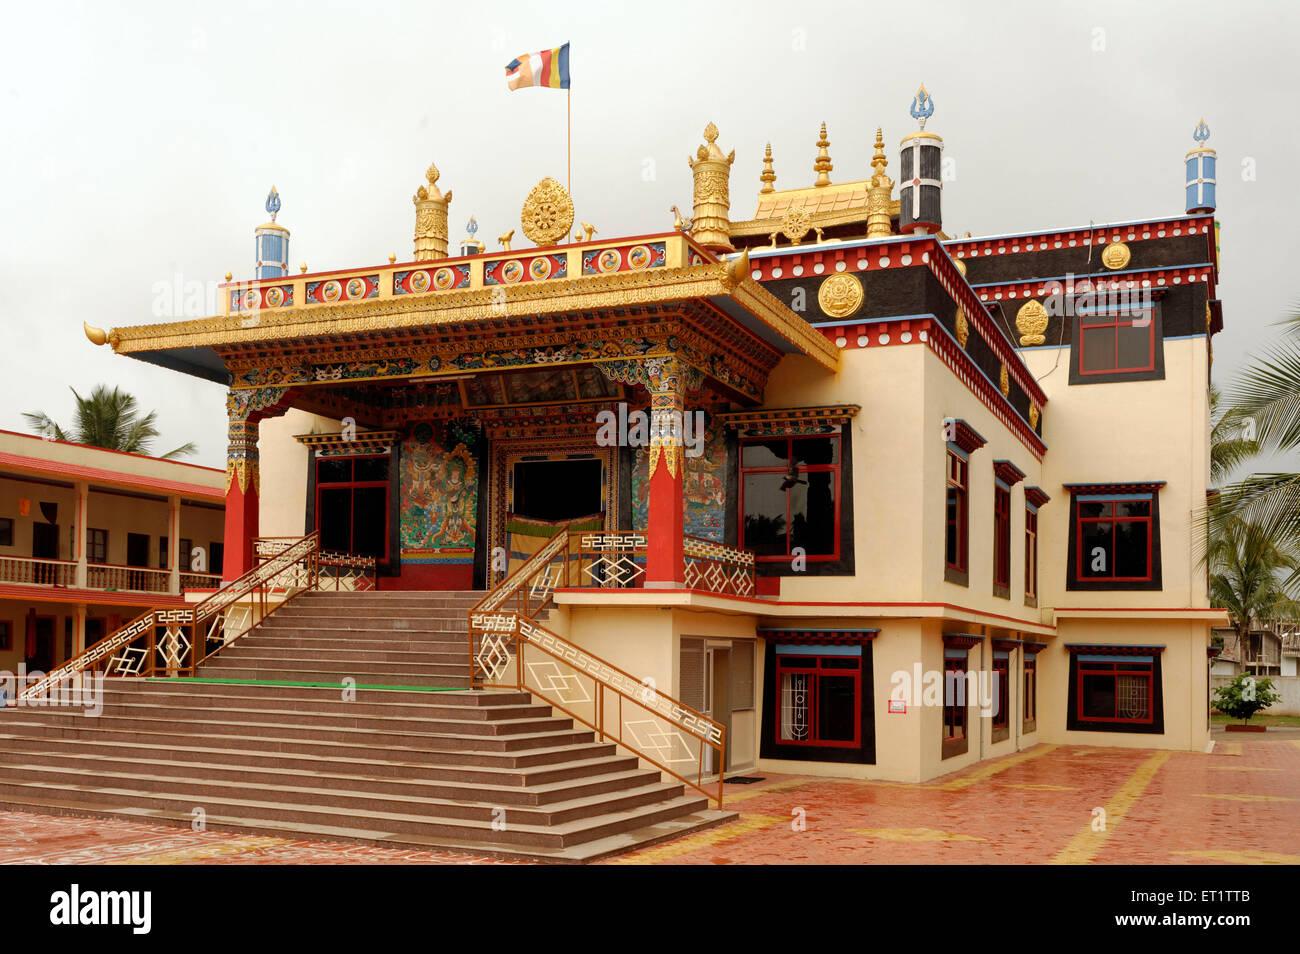 Shar Gaden Monastery in Mundgod At Karnataka India Asia - Stock Image